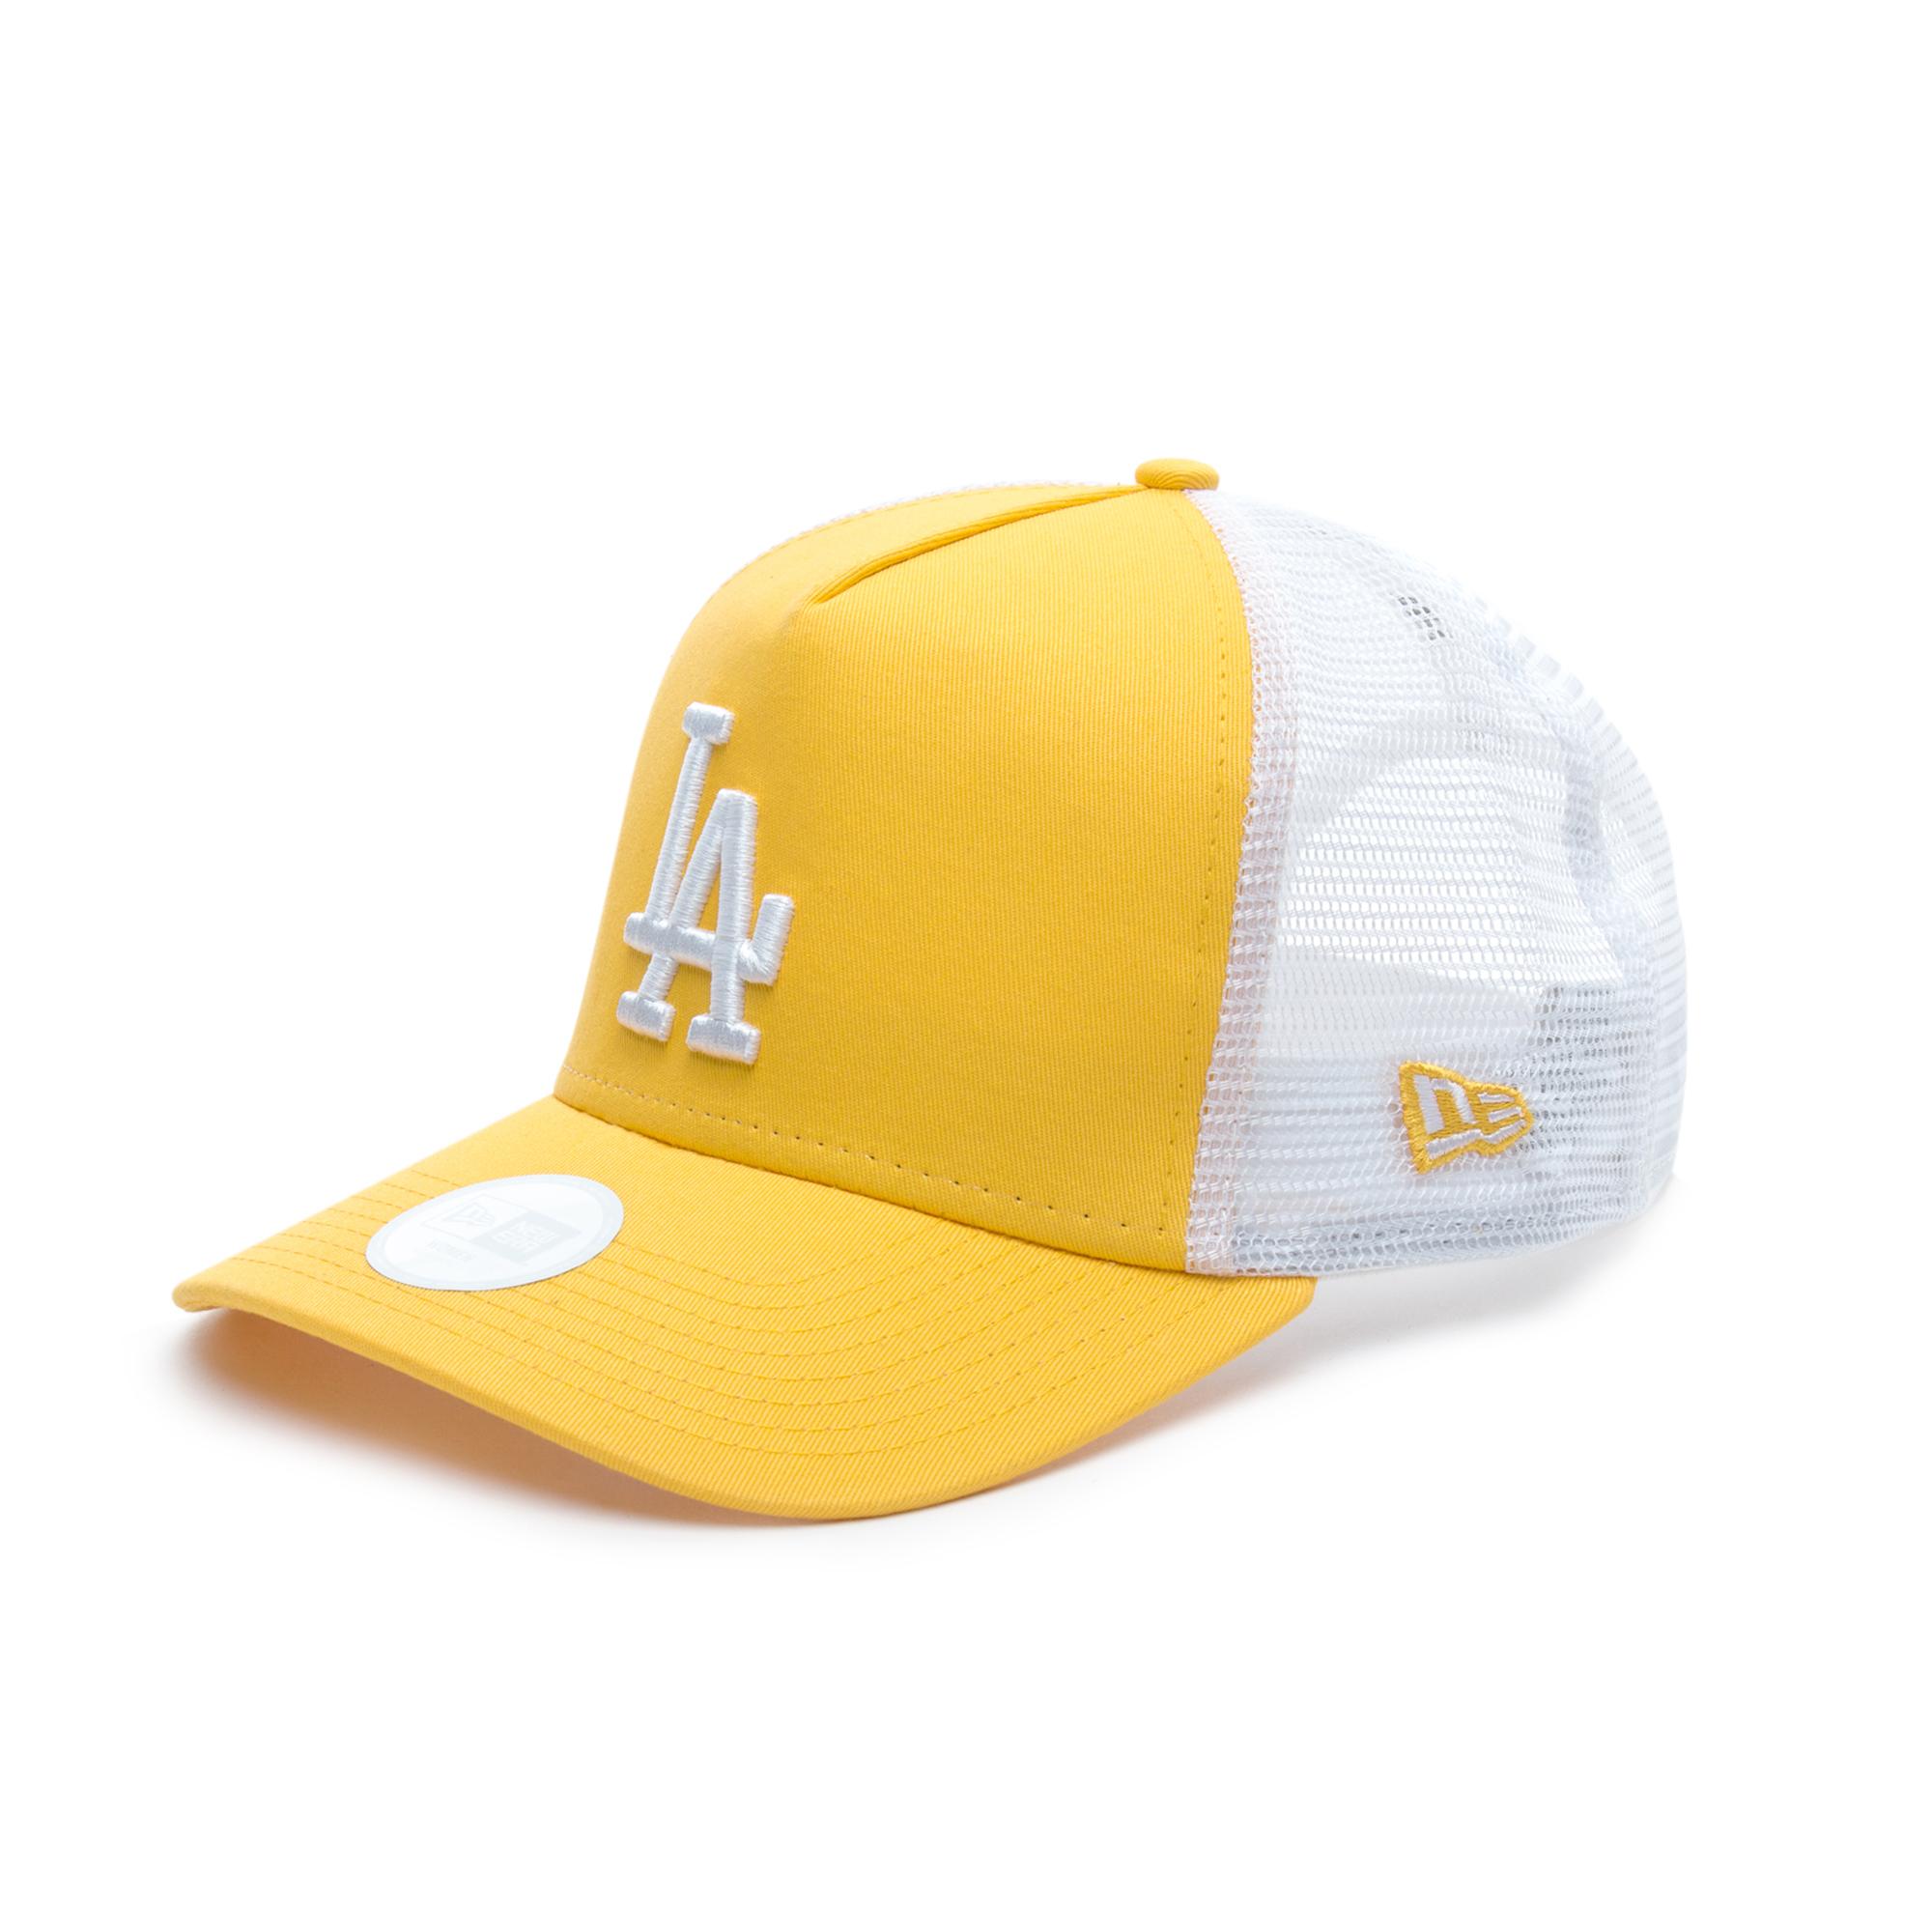 New Era Los Angeles Dodgers League Essential Sarı Unisex Şapka